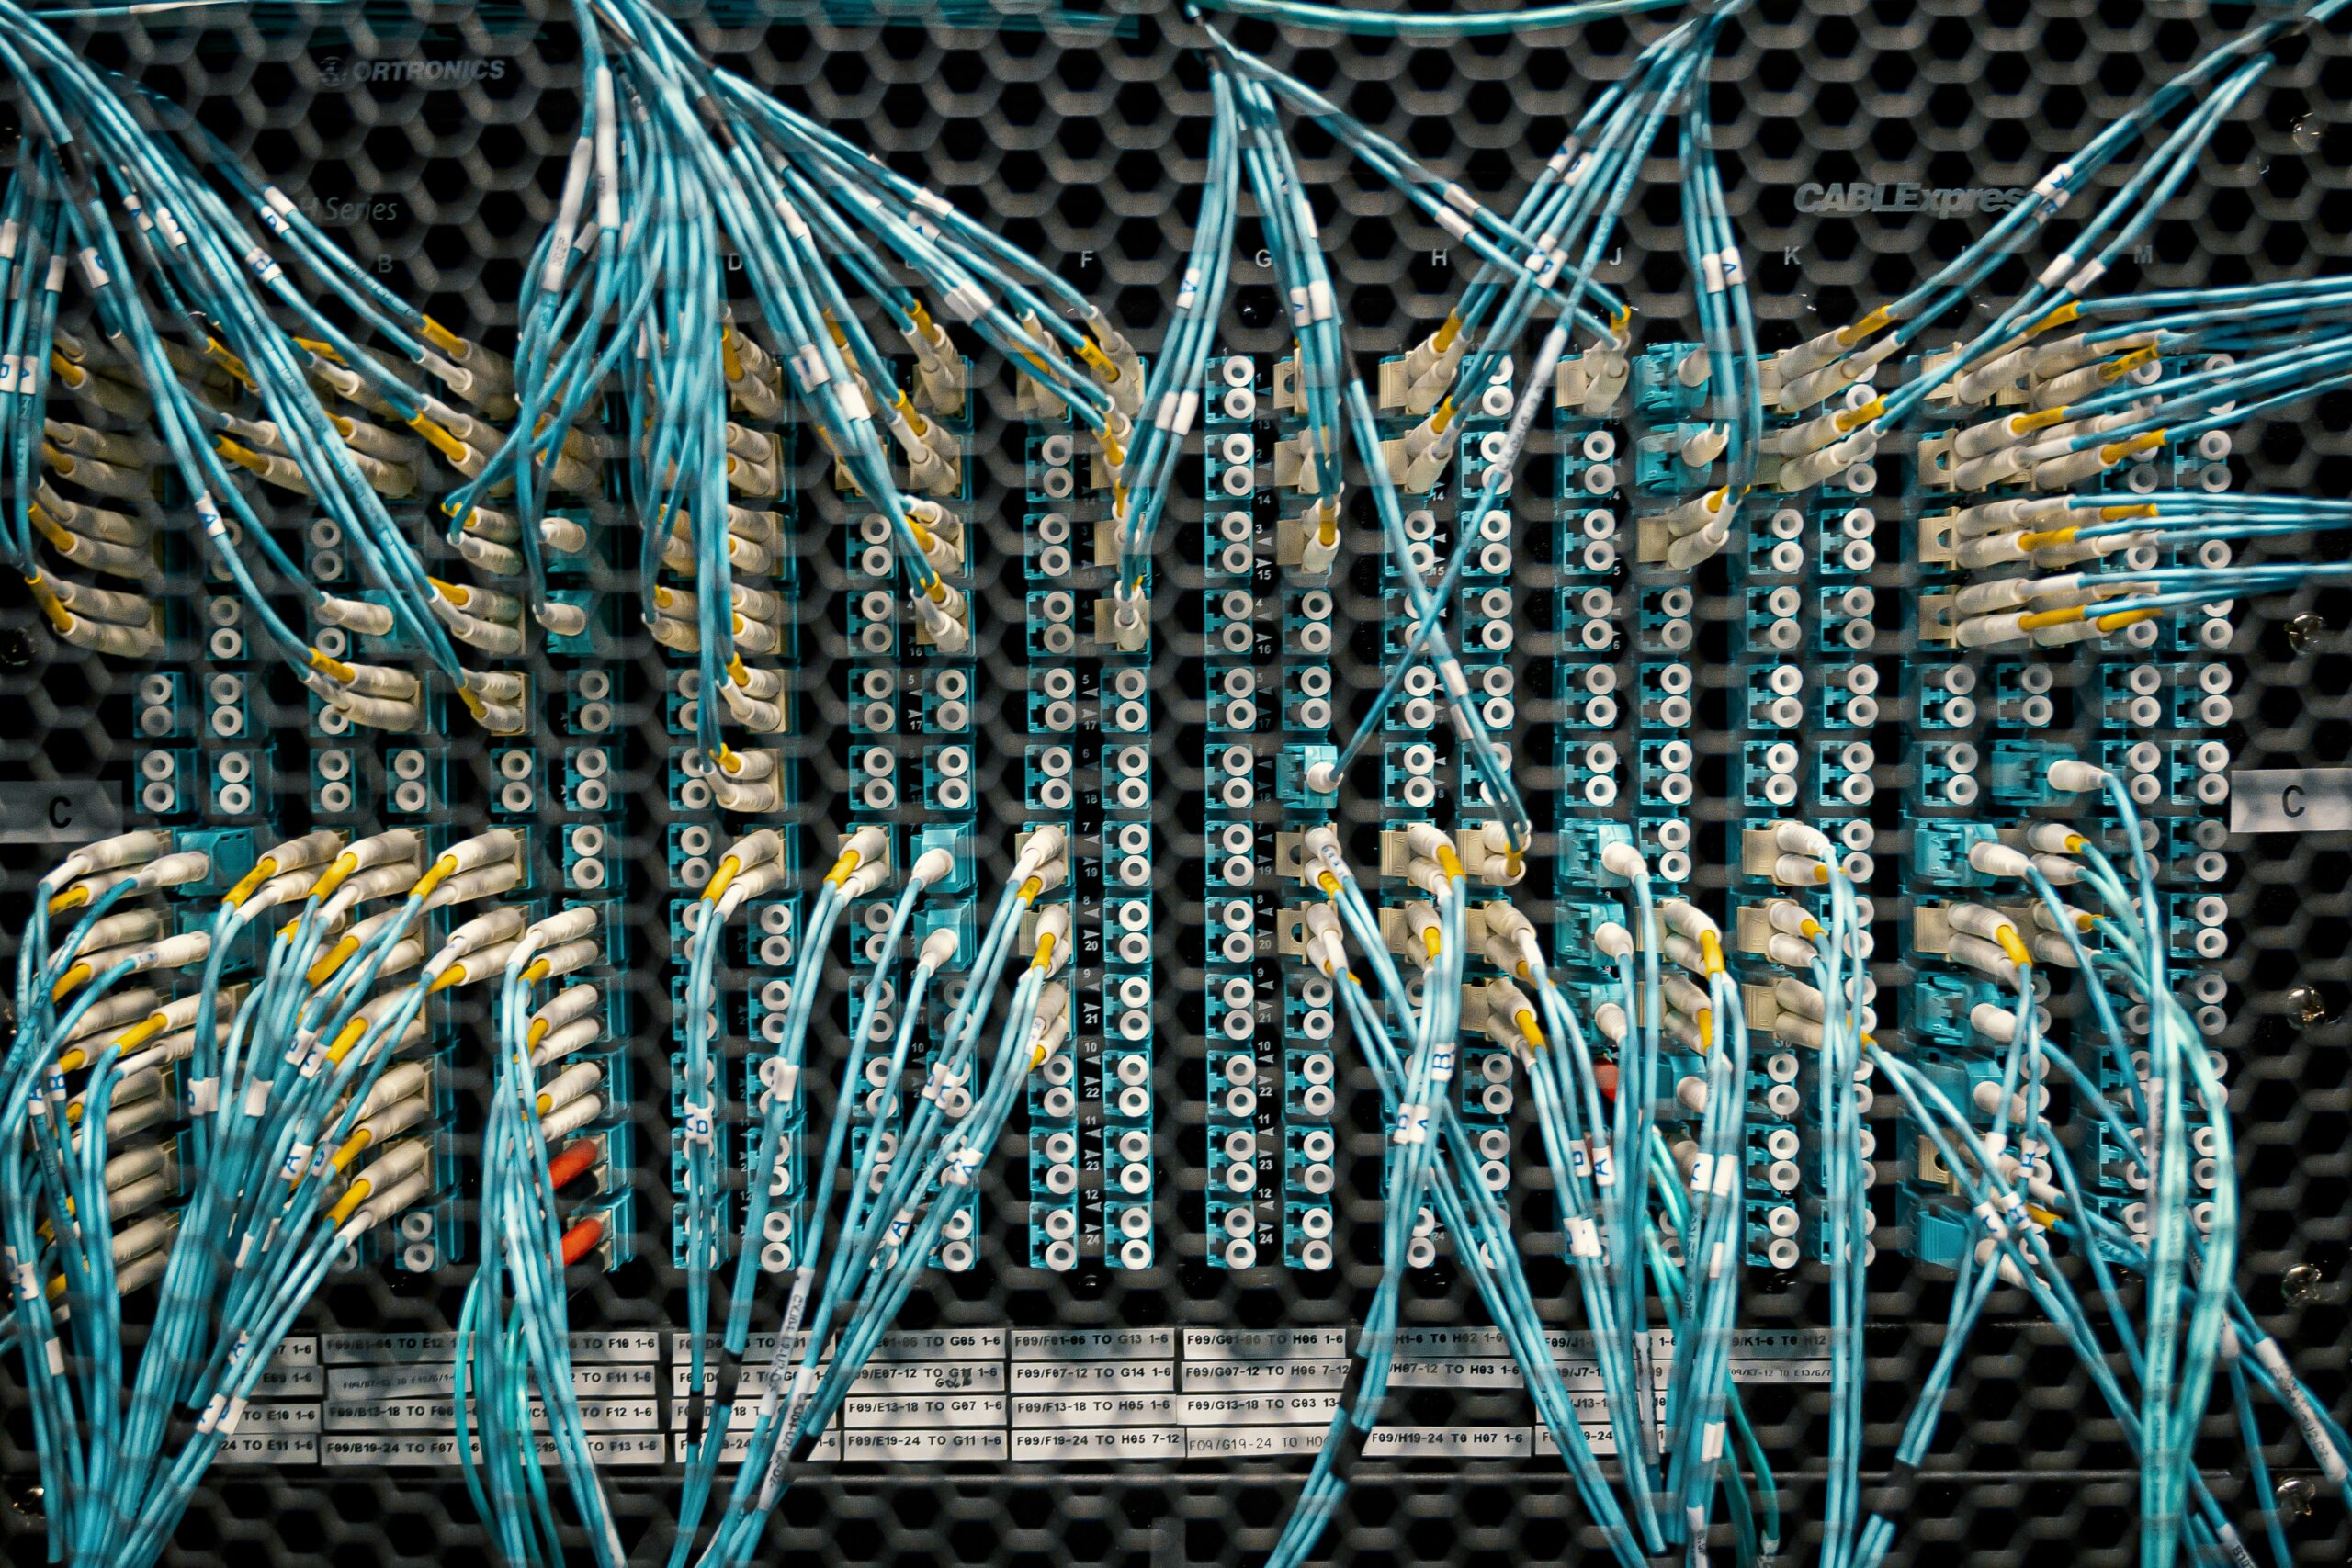 kable, fiber